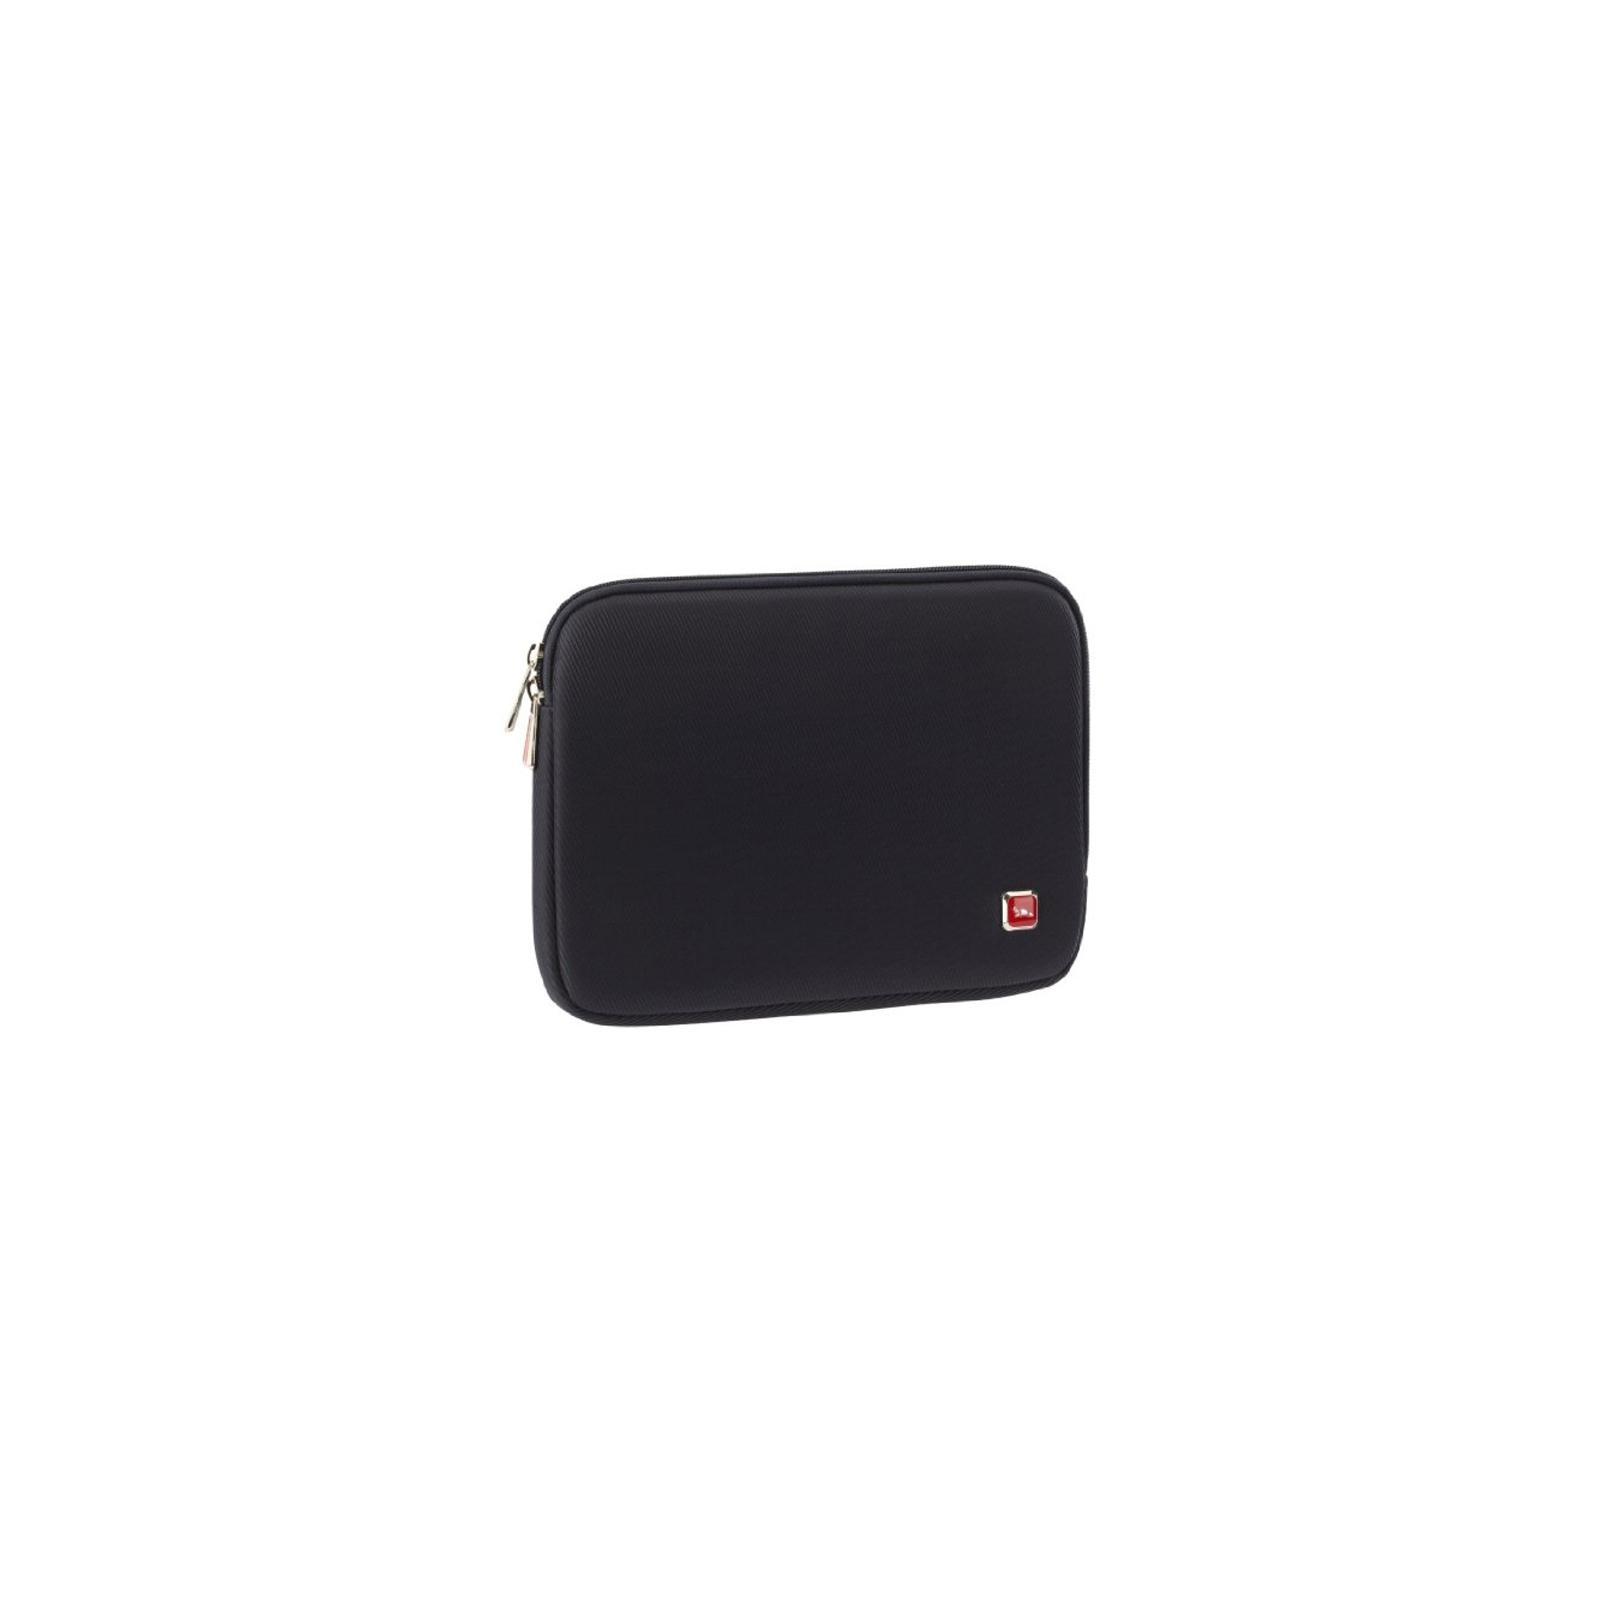 7284ee3dc53a Чехол для планшета RivaCase 10.1 Universal (5210 (Black)) цены в ...